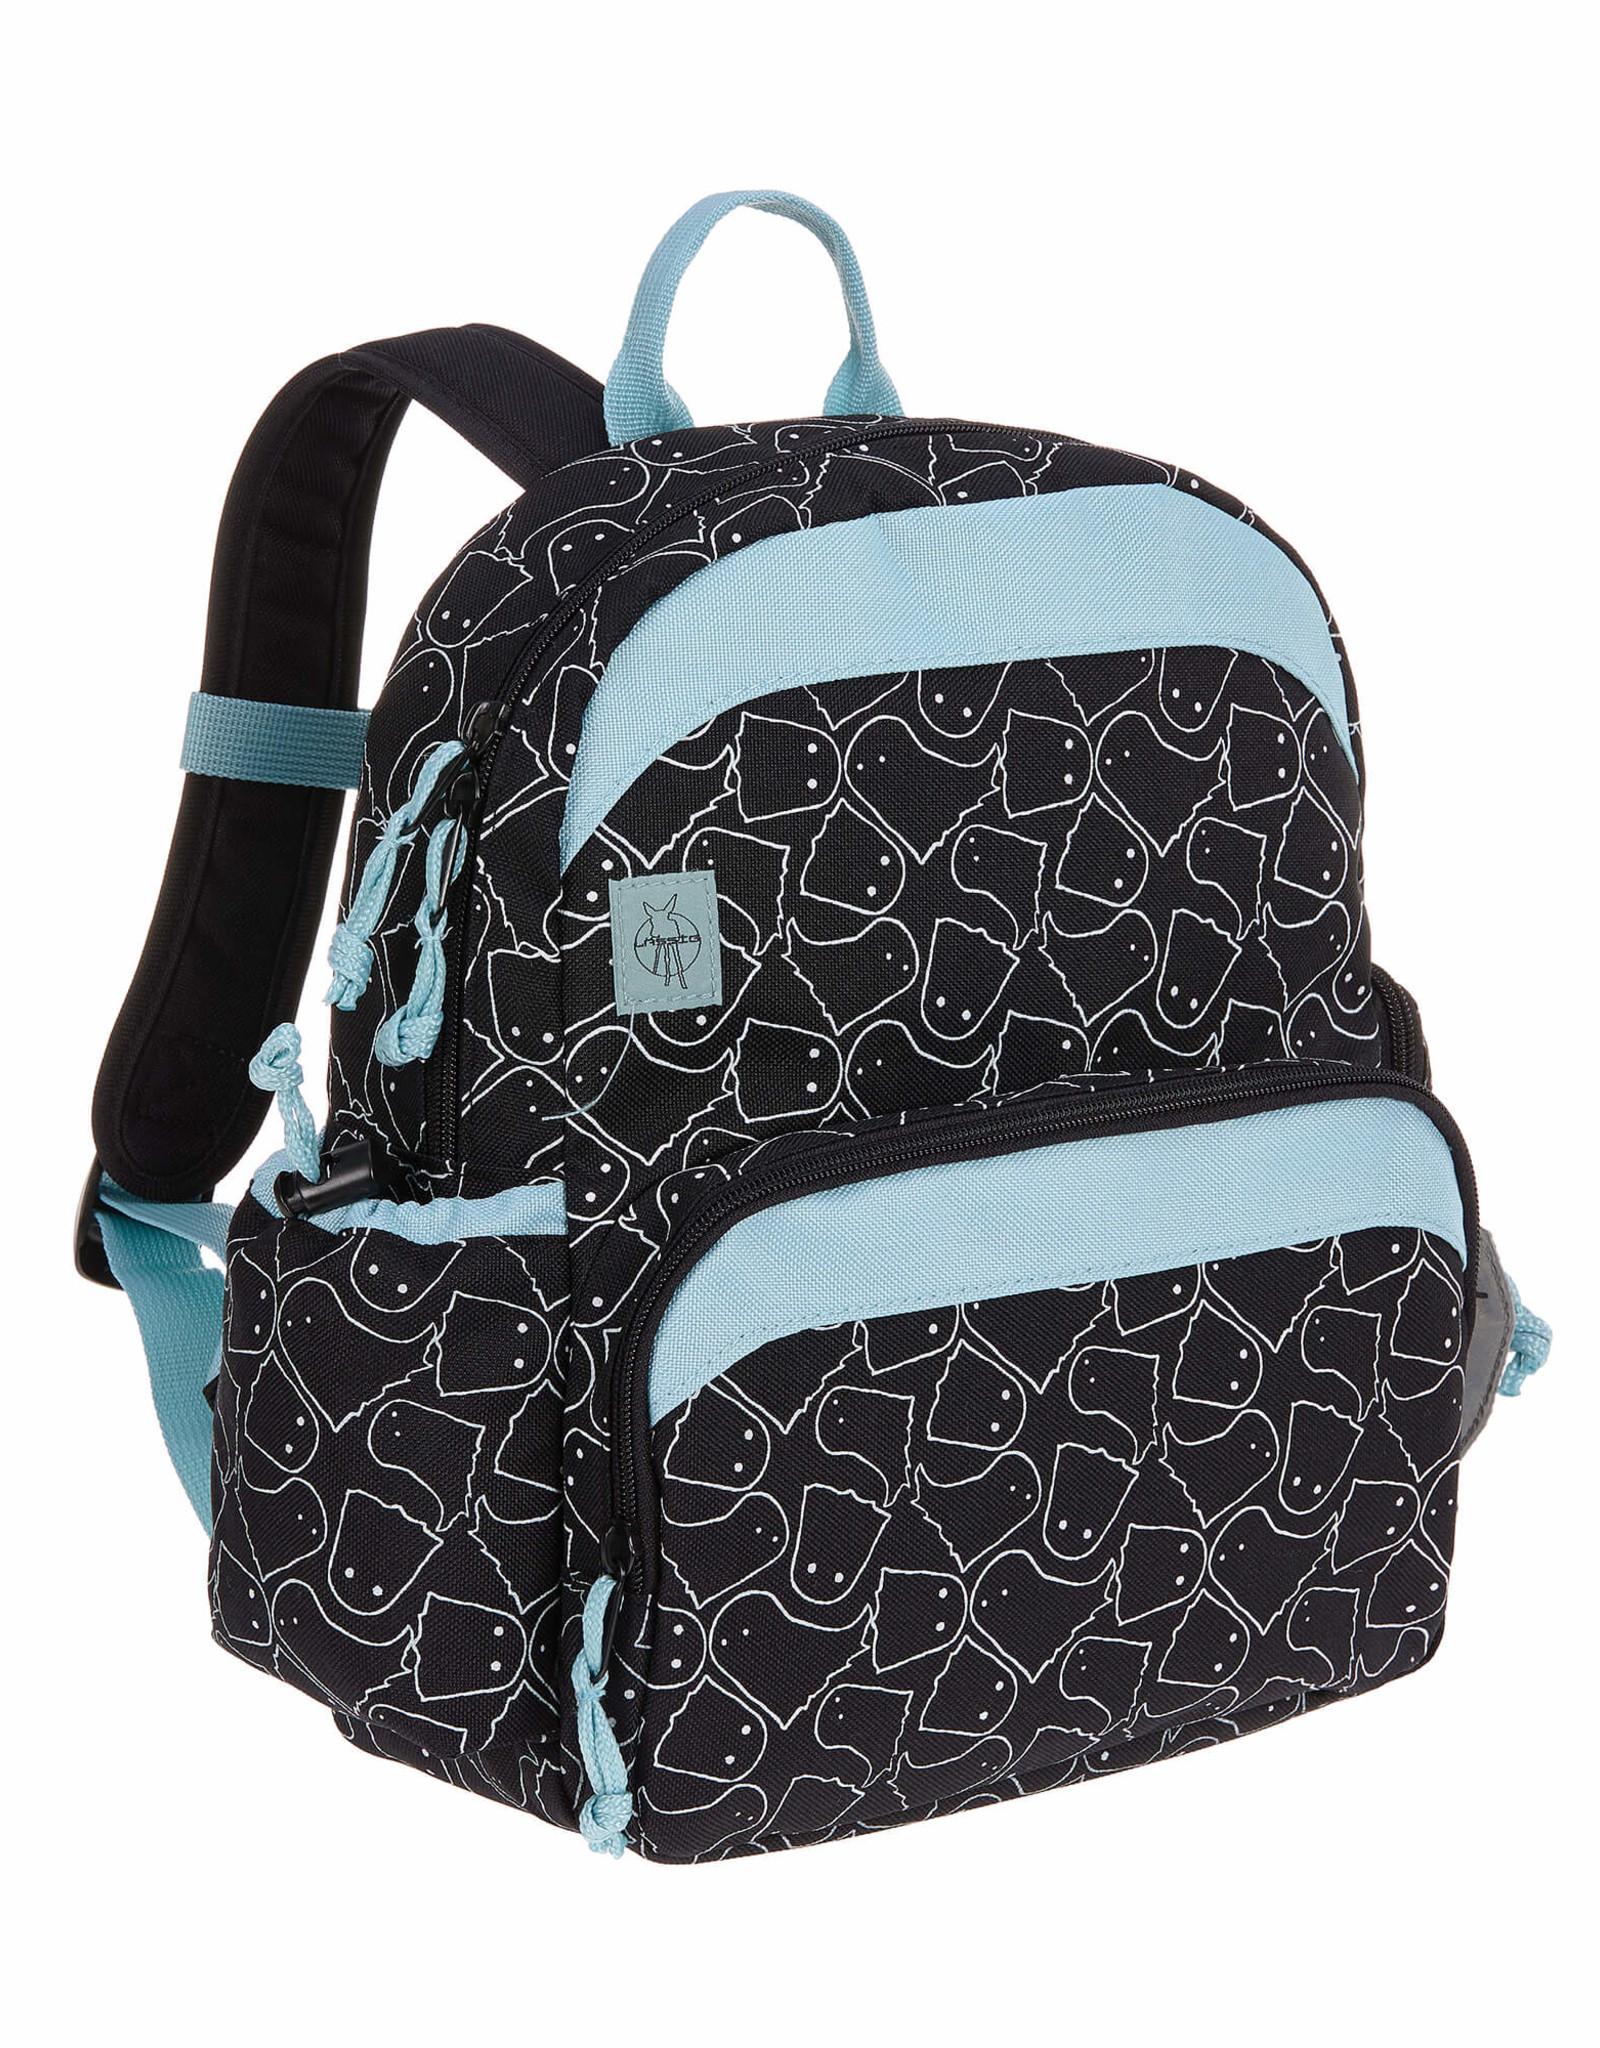 Lässig Backpack medium Spooky black